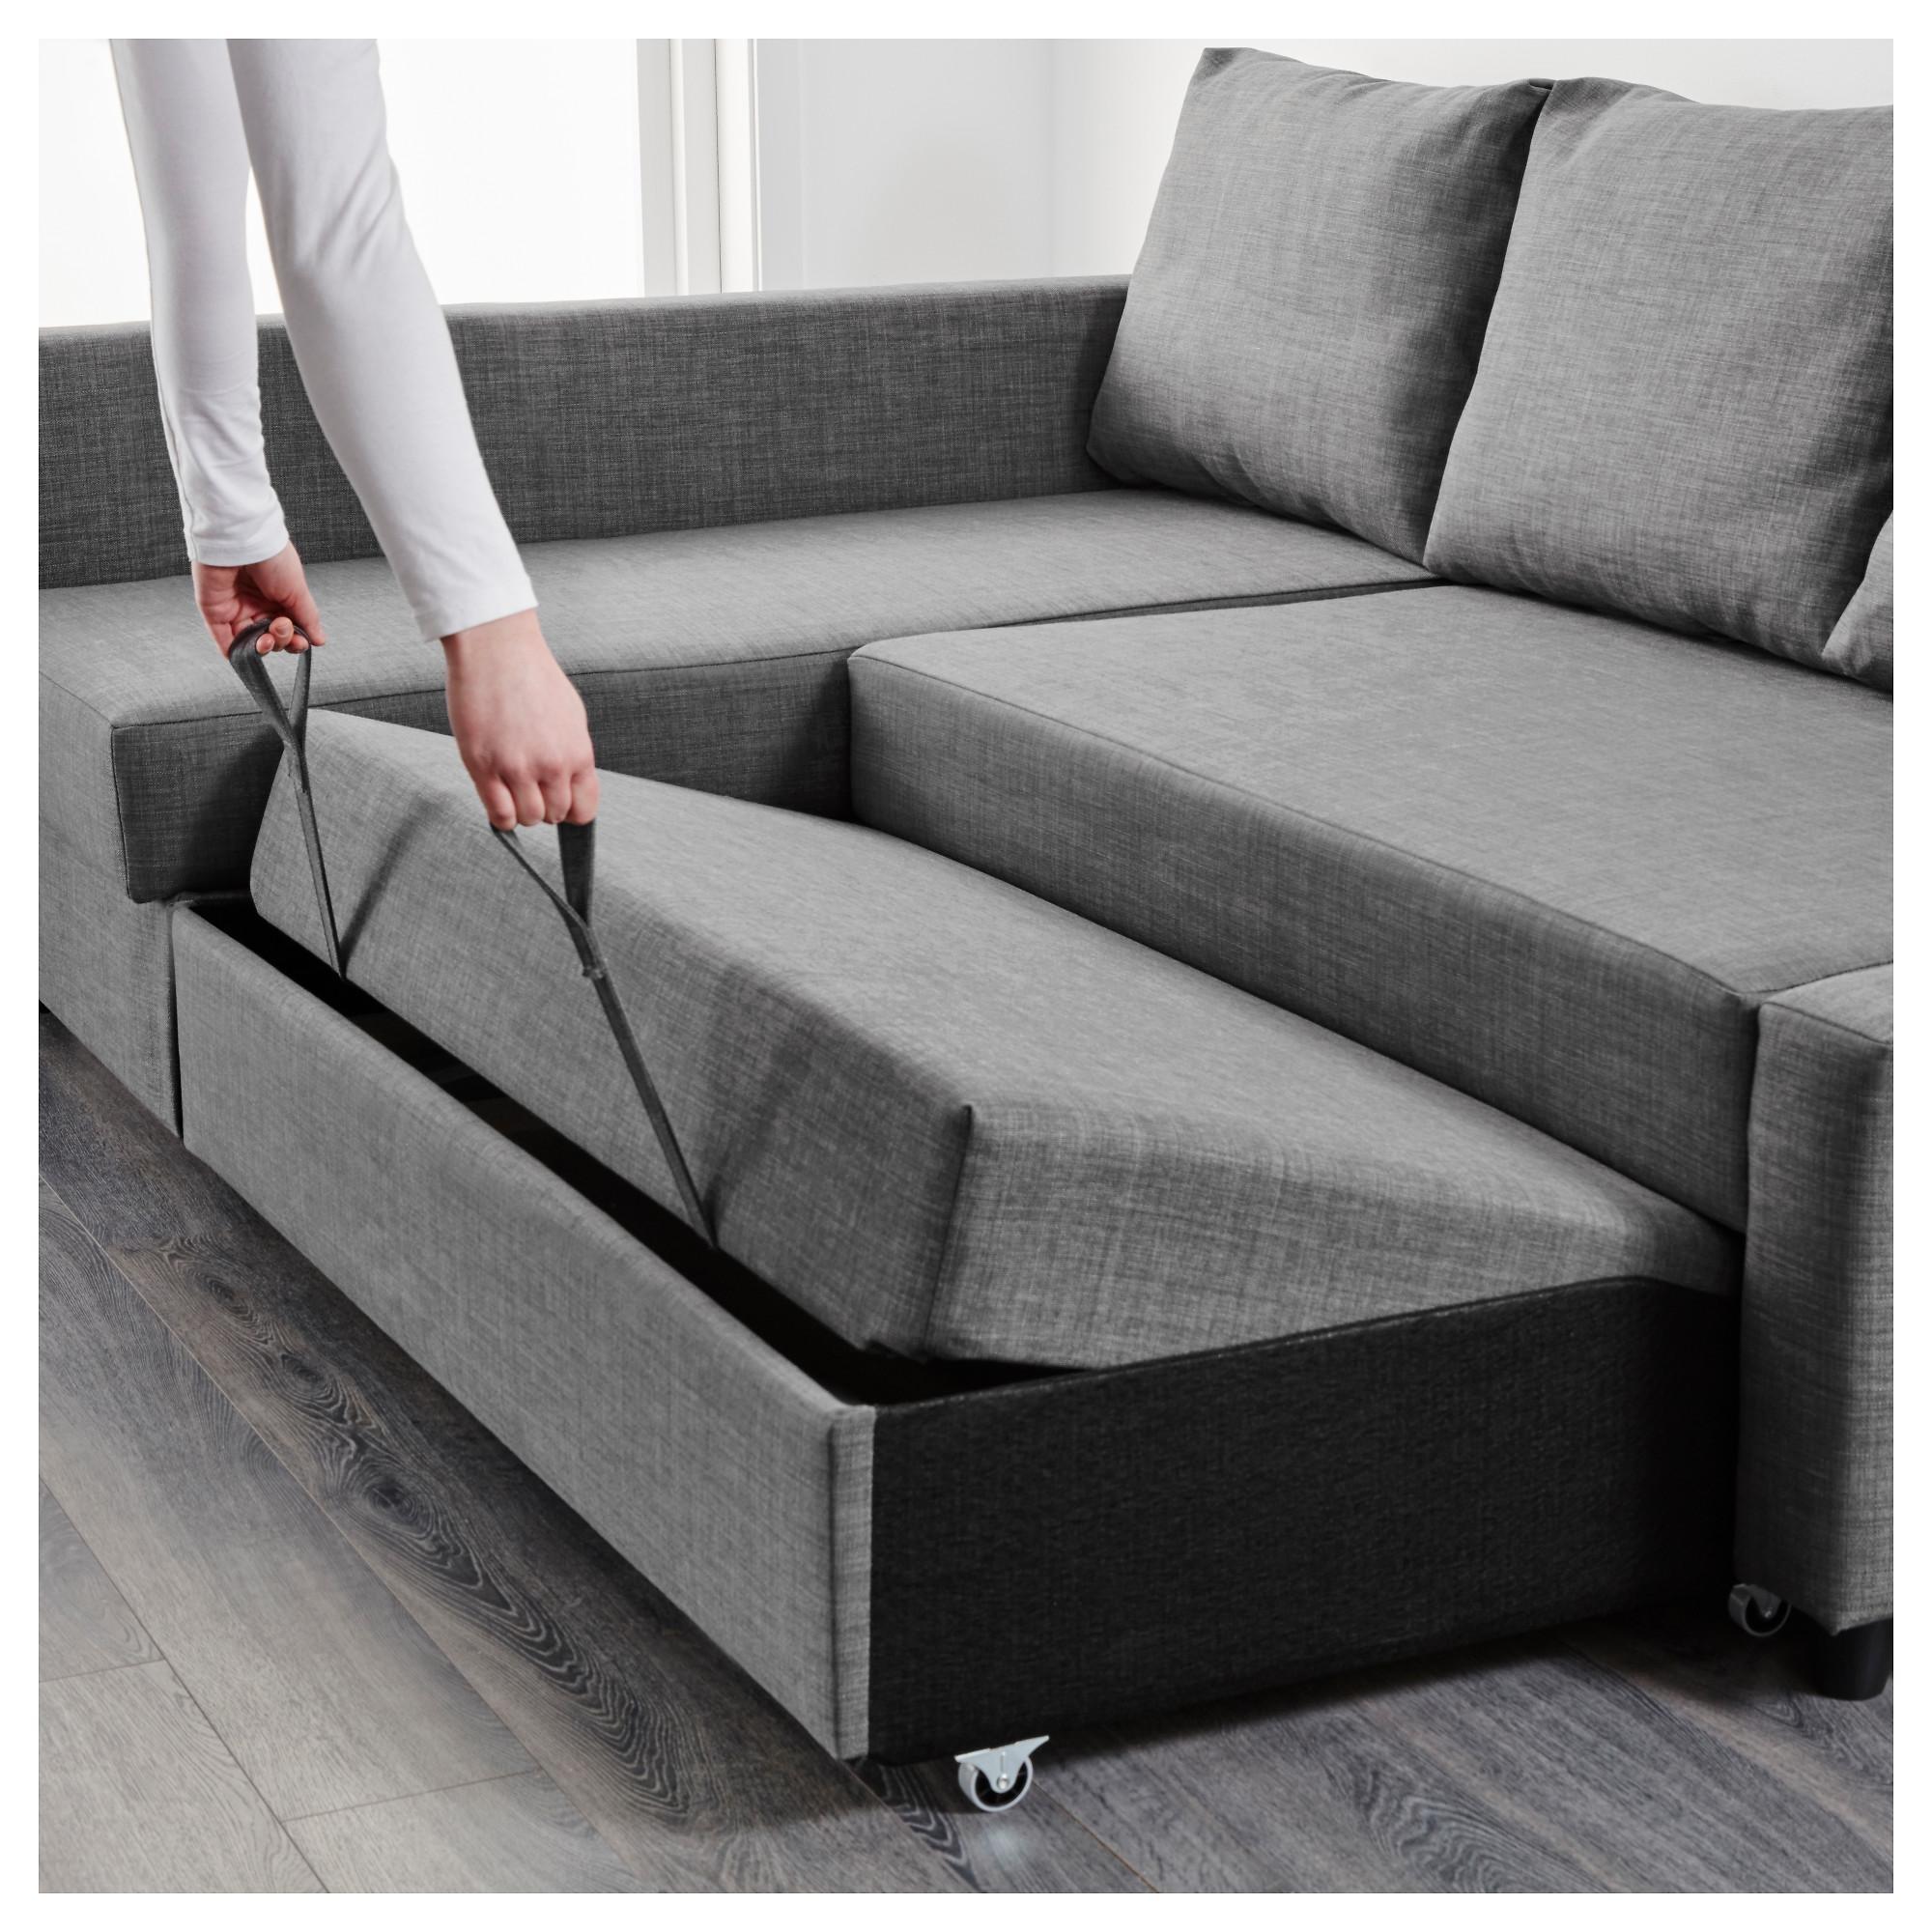 Sofas Center : Corner Sofa Beds Uk Cheap Birminghamcorner For Throughout Cheap Corner Sofas (View 19 of 20)